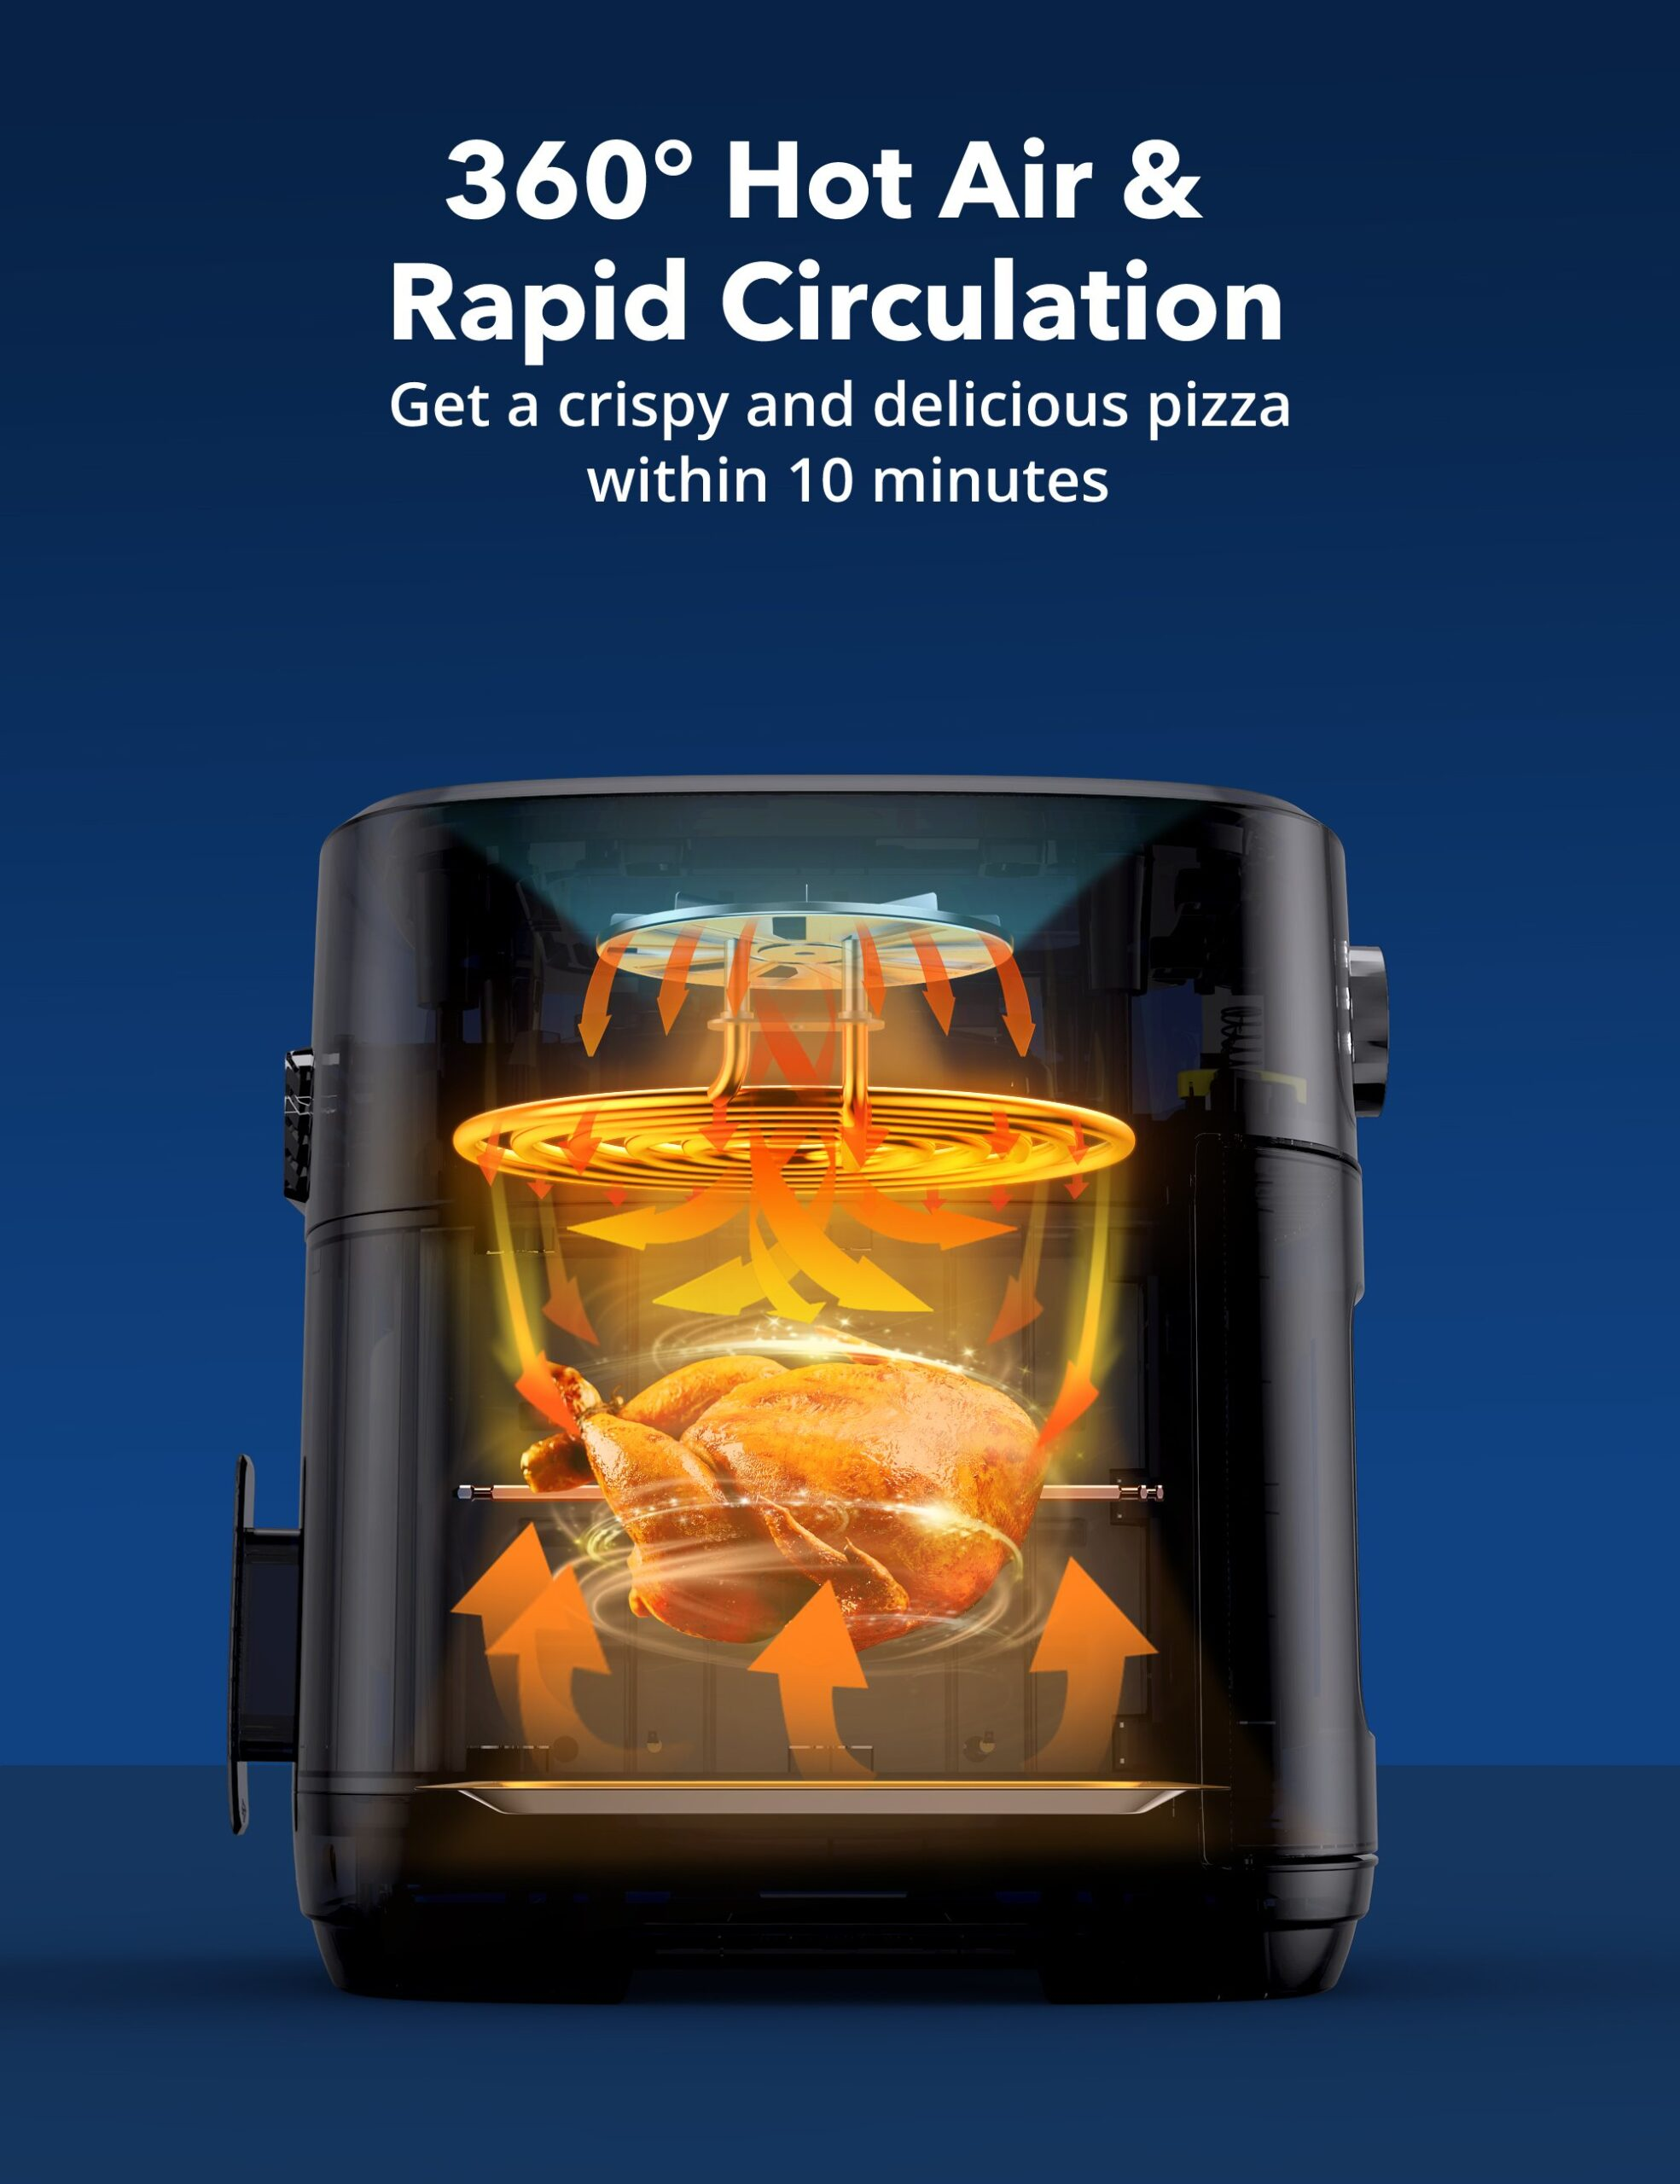 360 degree hot air and rapid circulation